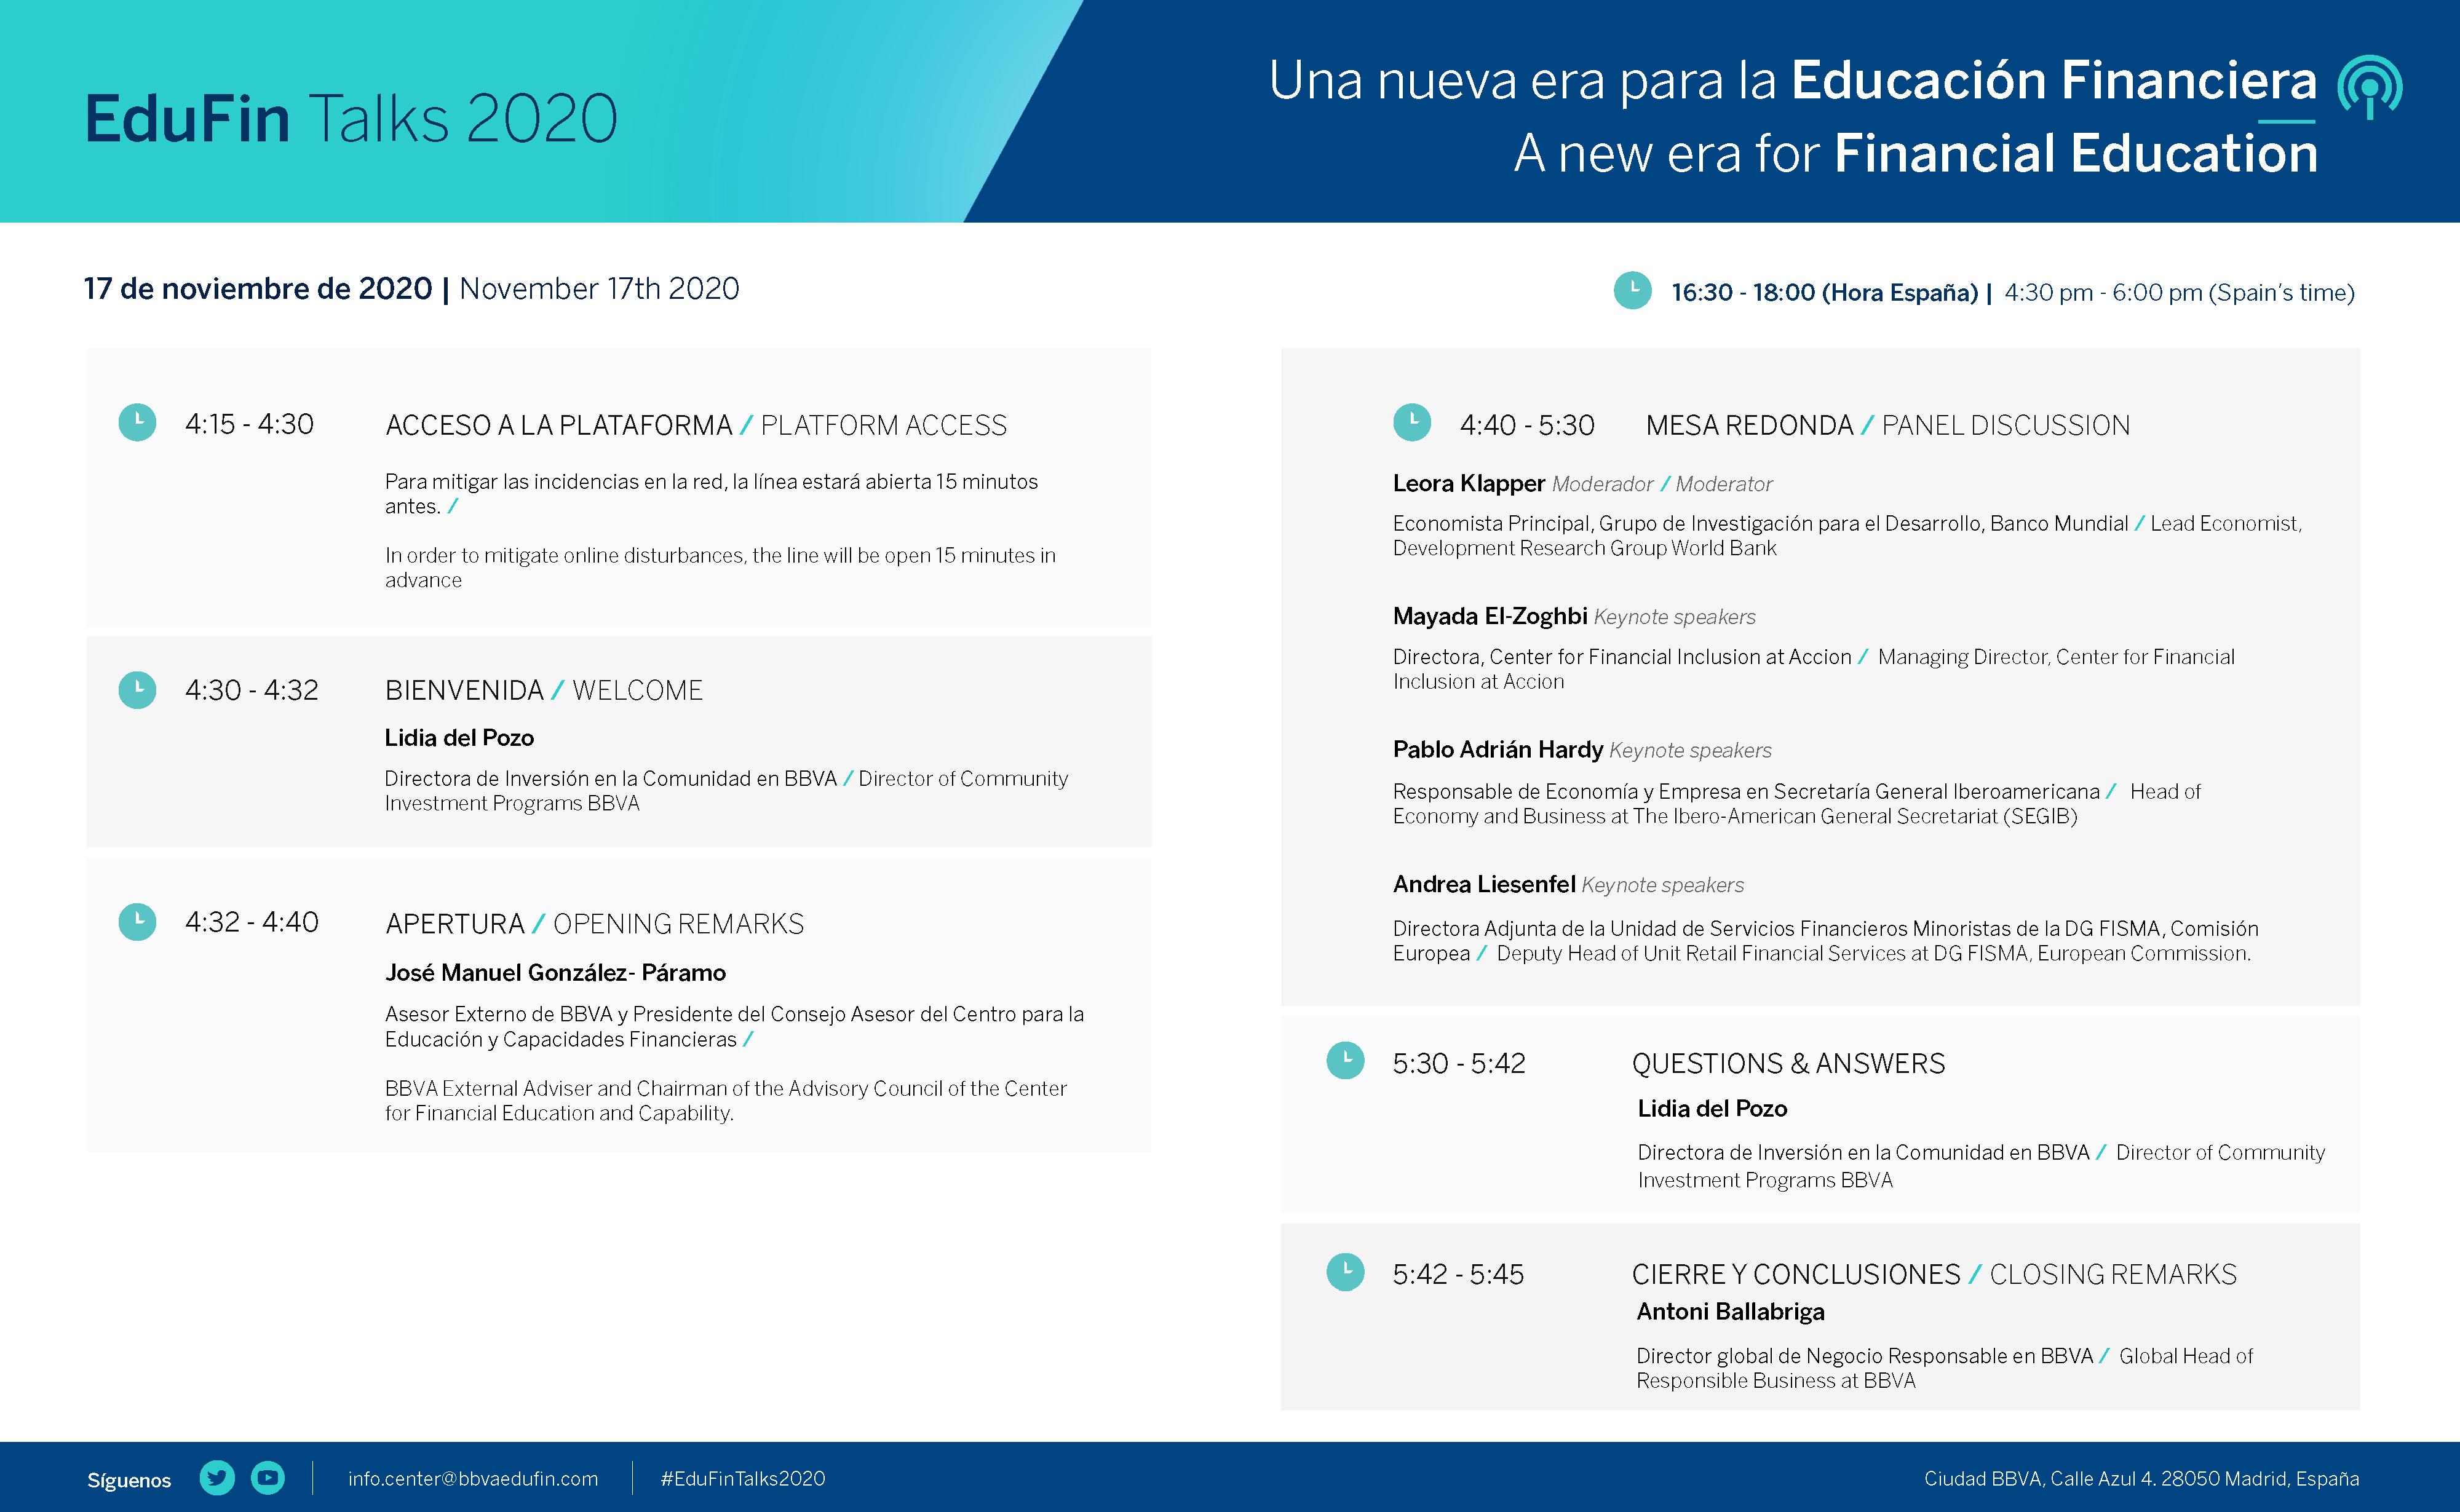 Programa EduFin Talks 2020